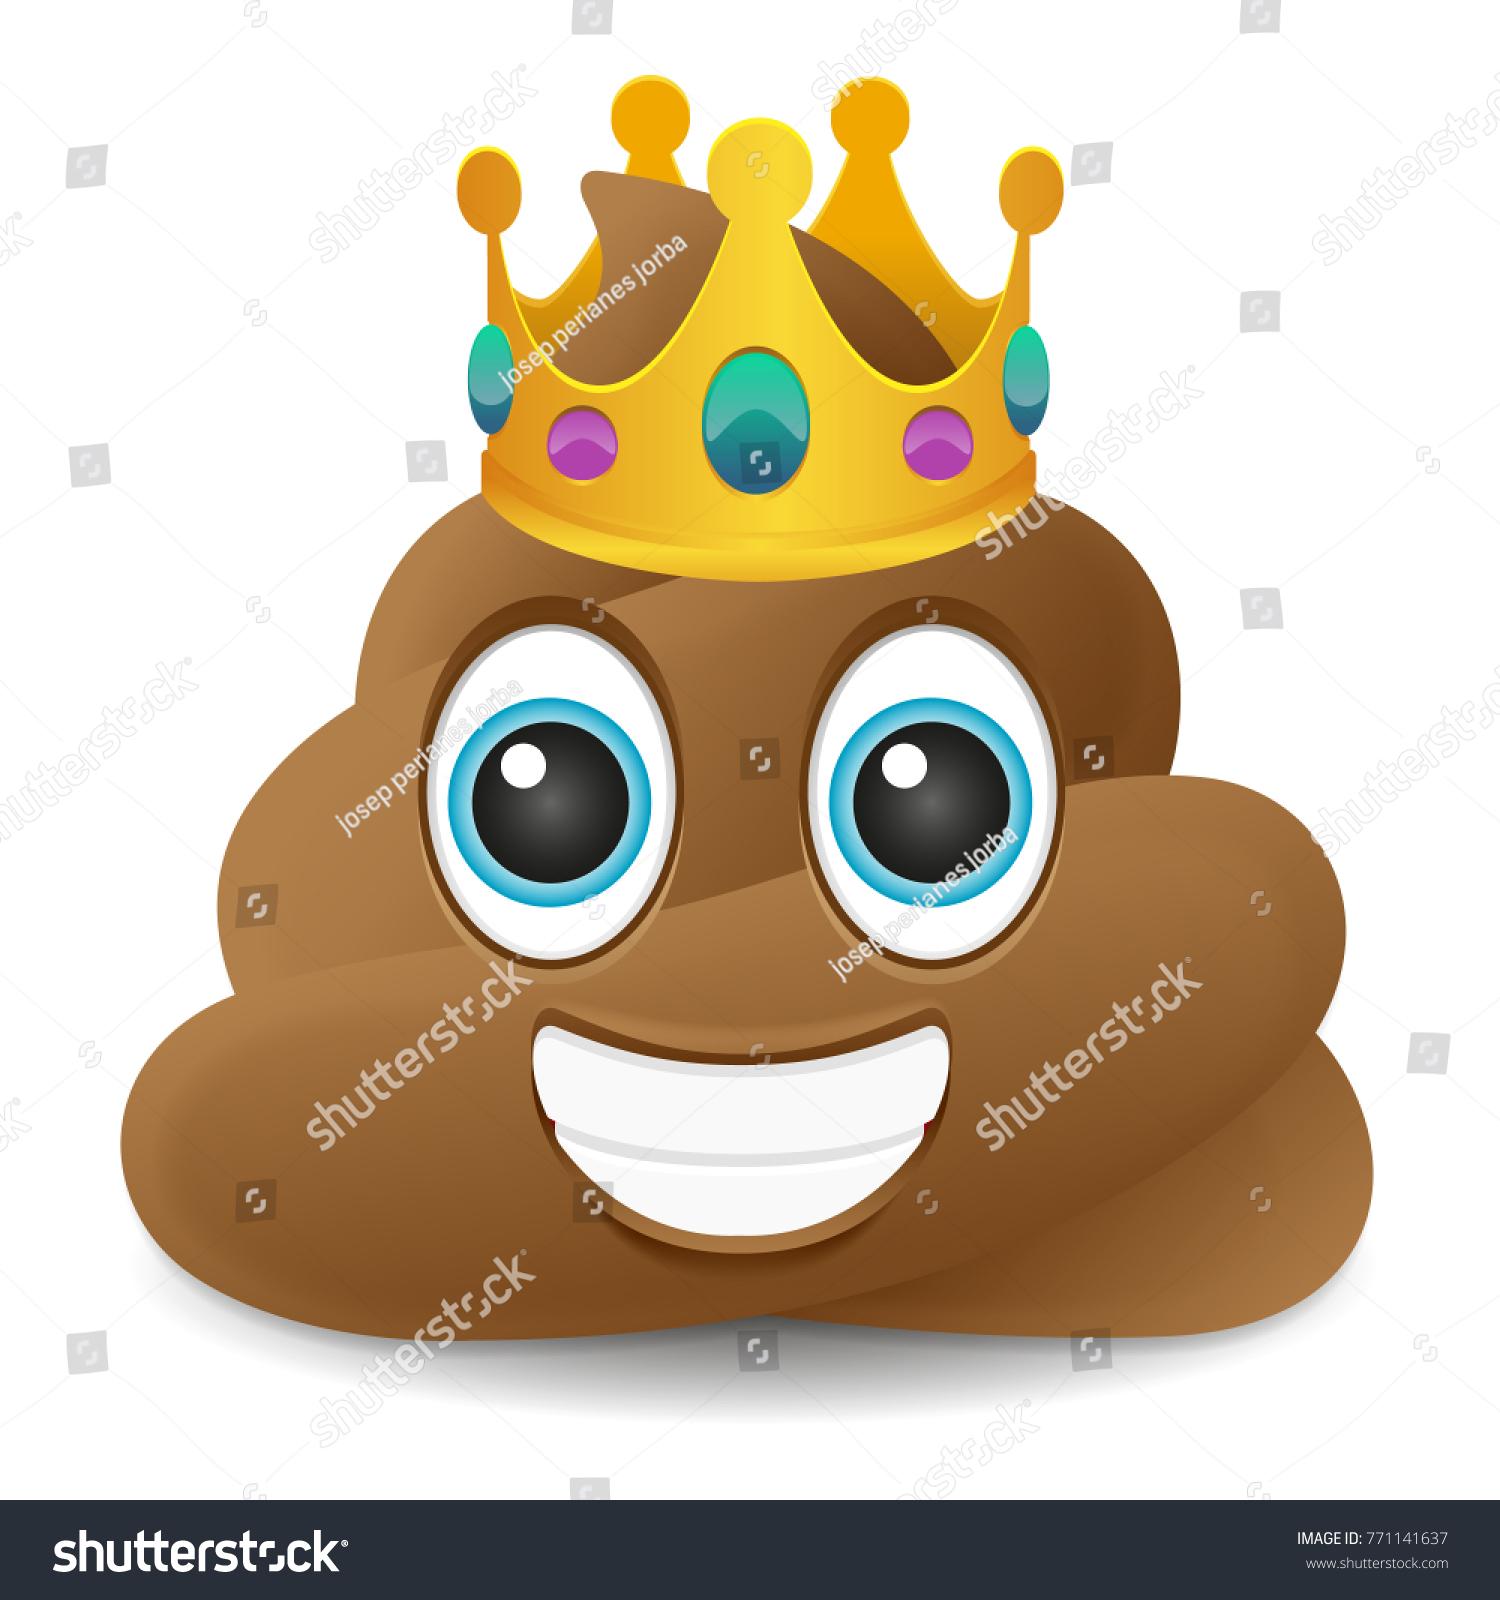 Pile poo king crown emoji icon stock vector 771141637 shutterstock pile of poo king crown emoji icon object symbol gradient vector art design cartoon isolated background biocorpaavc Gallery